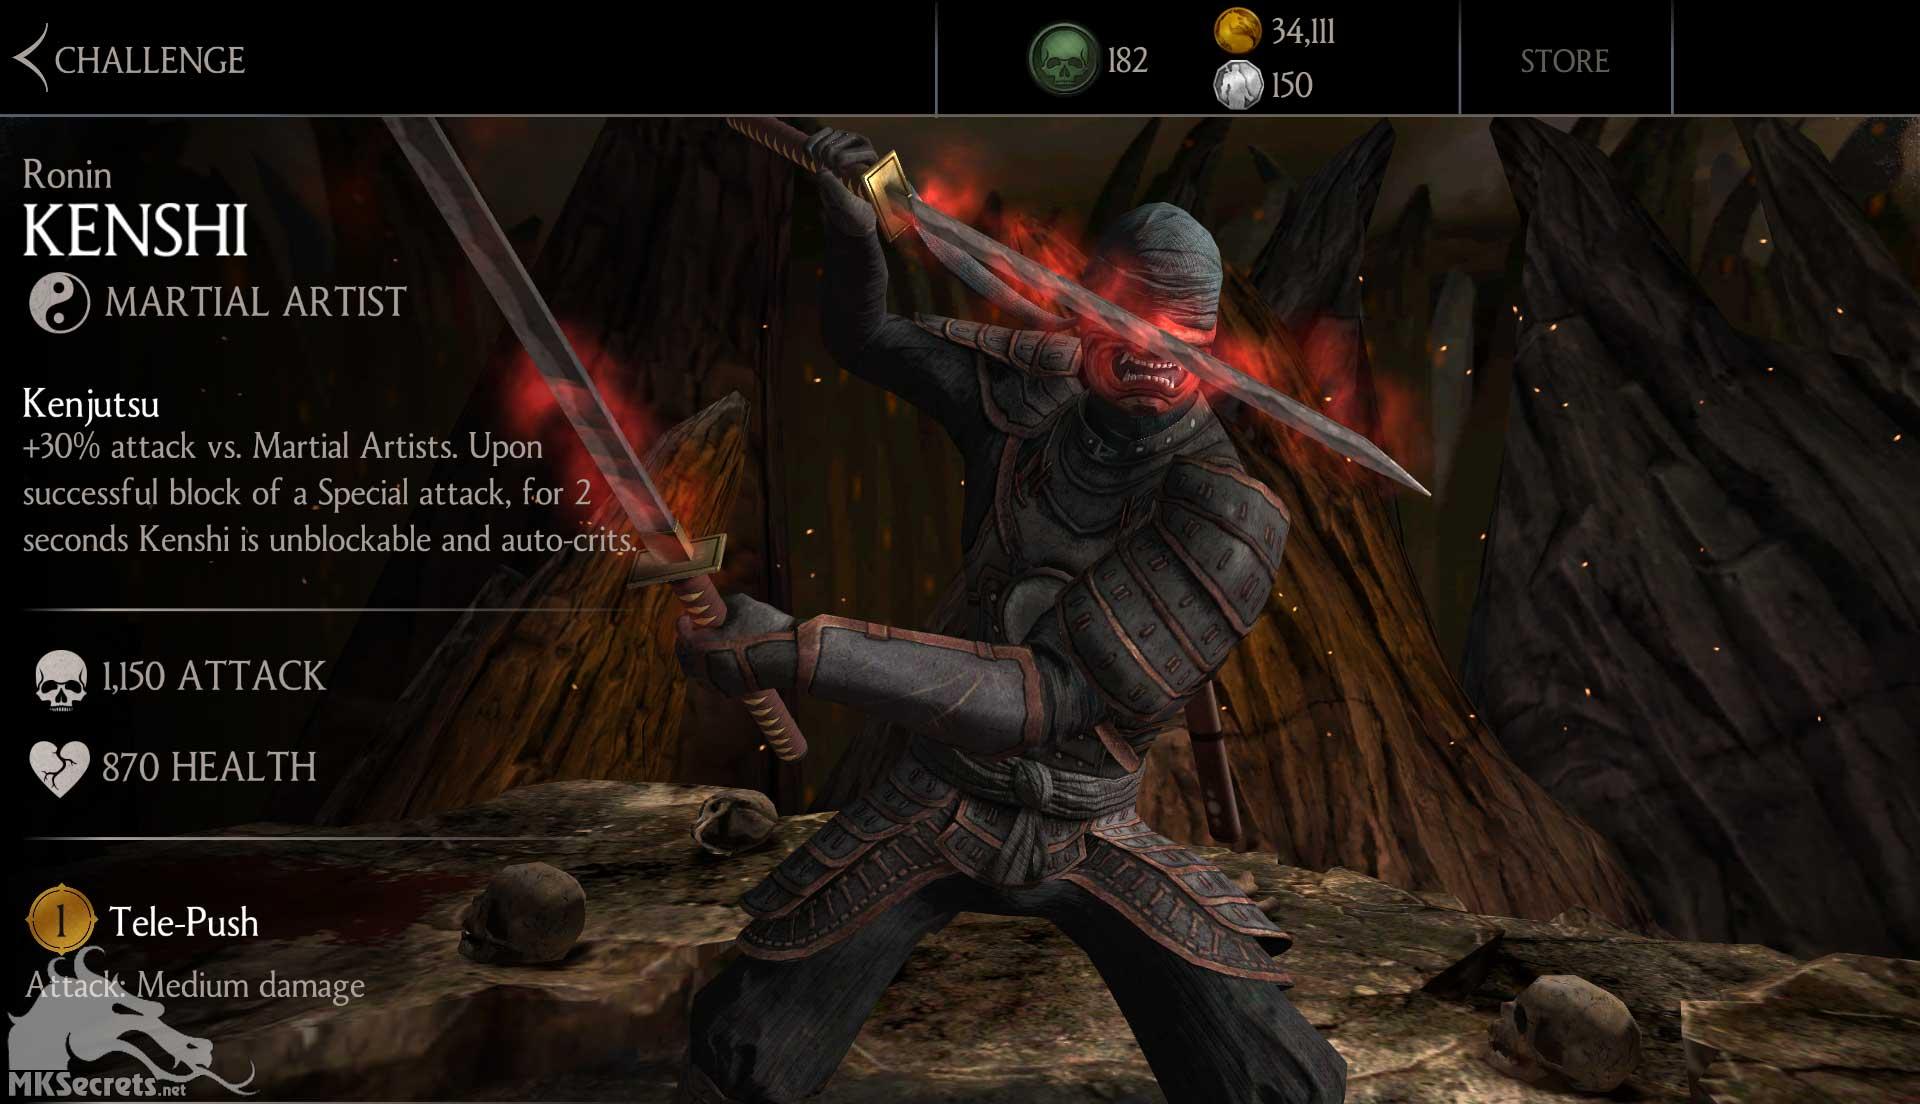 Mortal Kombat X Mobile Ronin Kenshi Challenge Ends Soon • Mortal